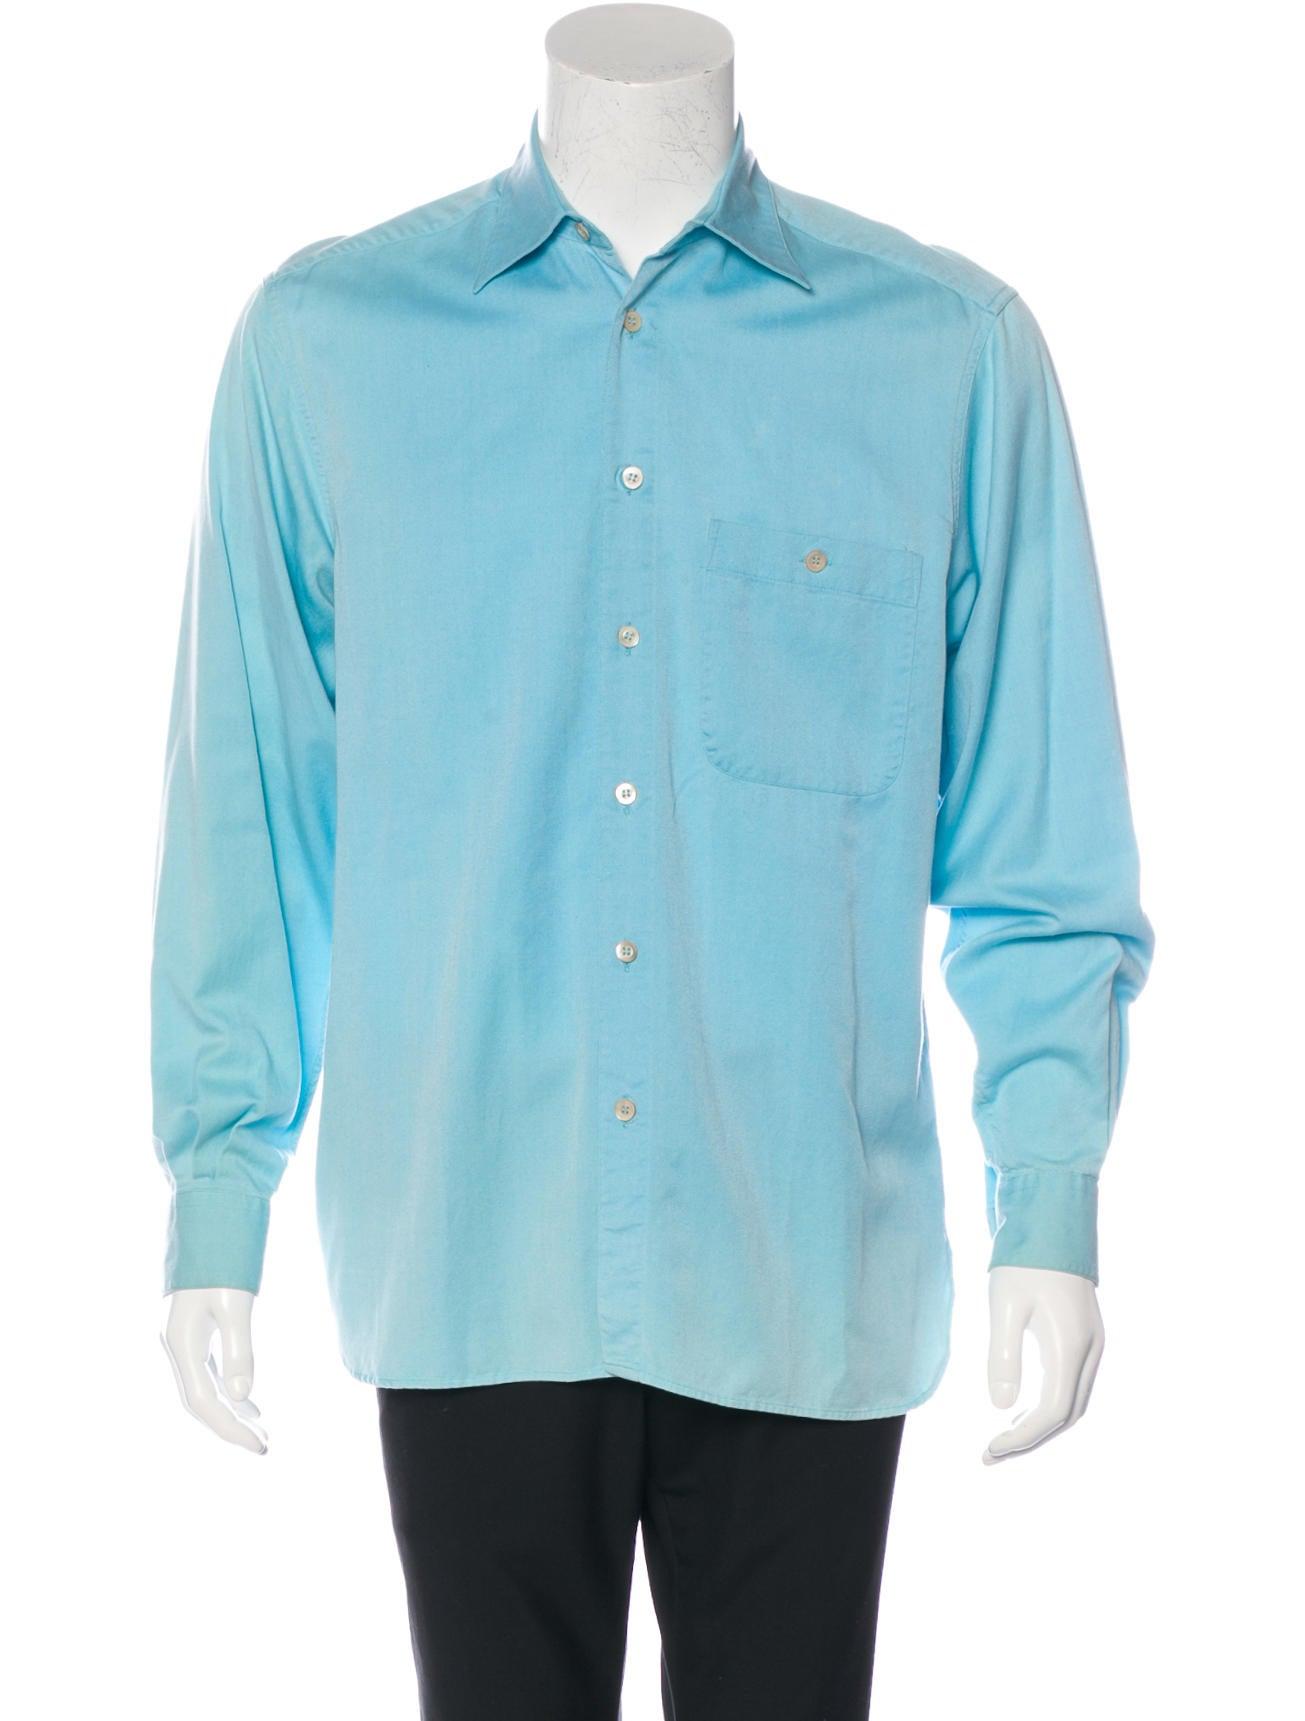 ermenegildo zegna jak twill shirt clothing zgn24019 the realreal. Black Bedroom Furniture Sets. Home Design Ideas